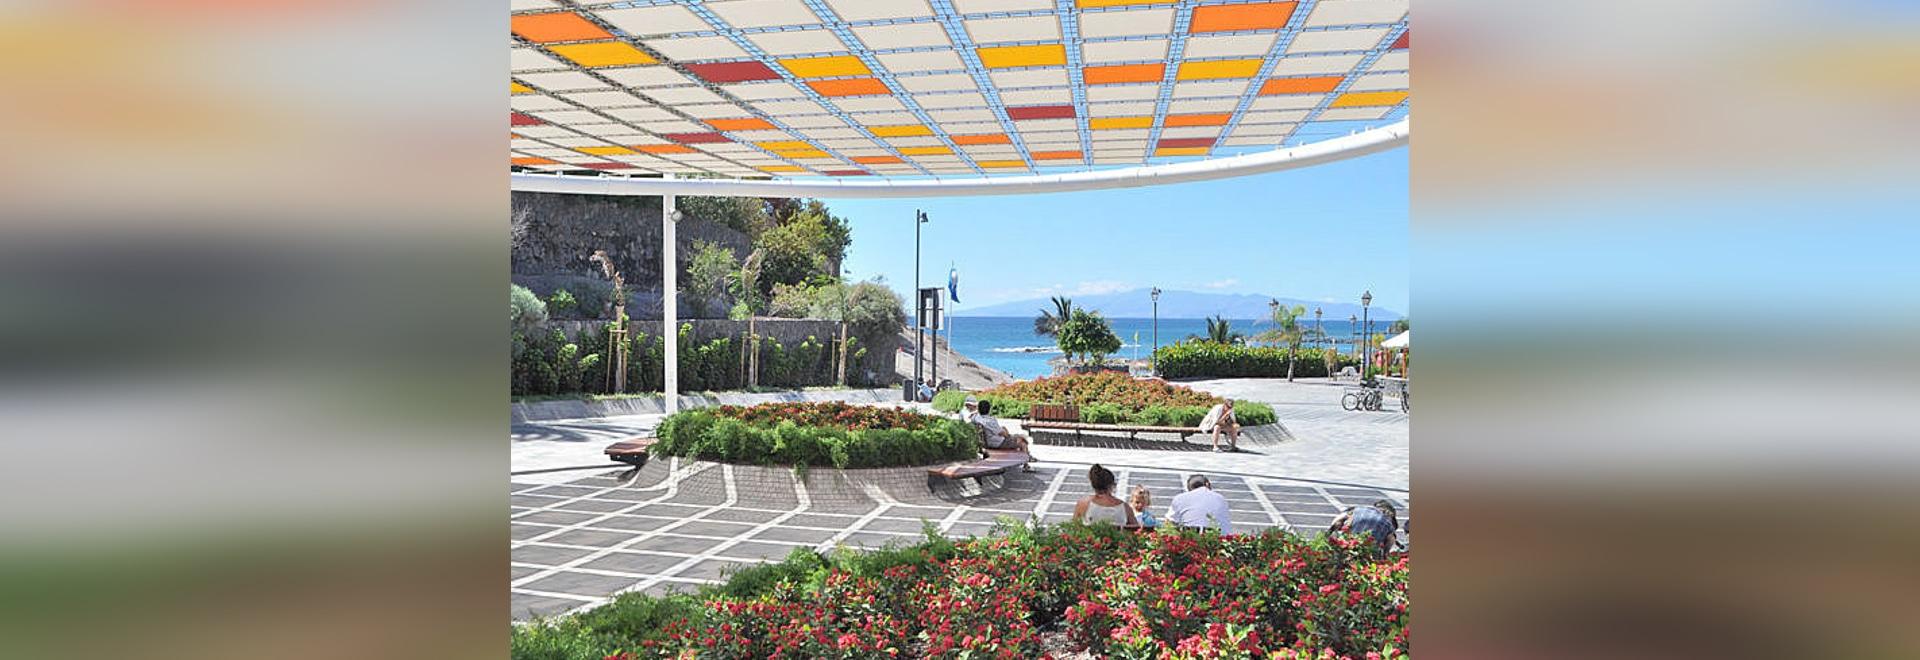 Adeje, Santa Cruz de Tenerife